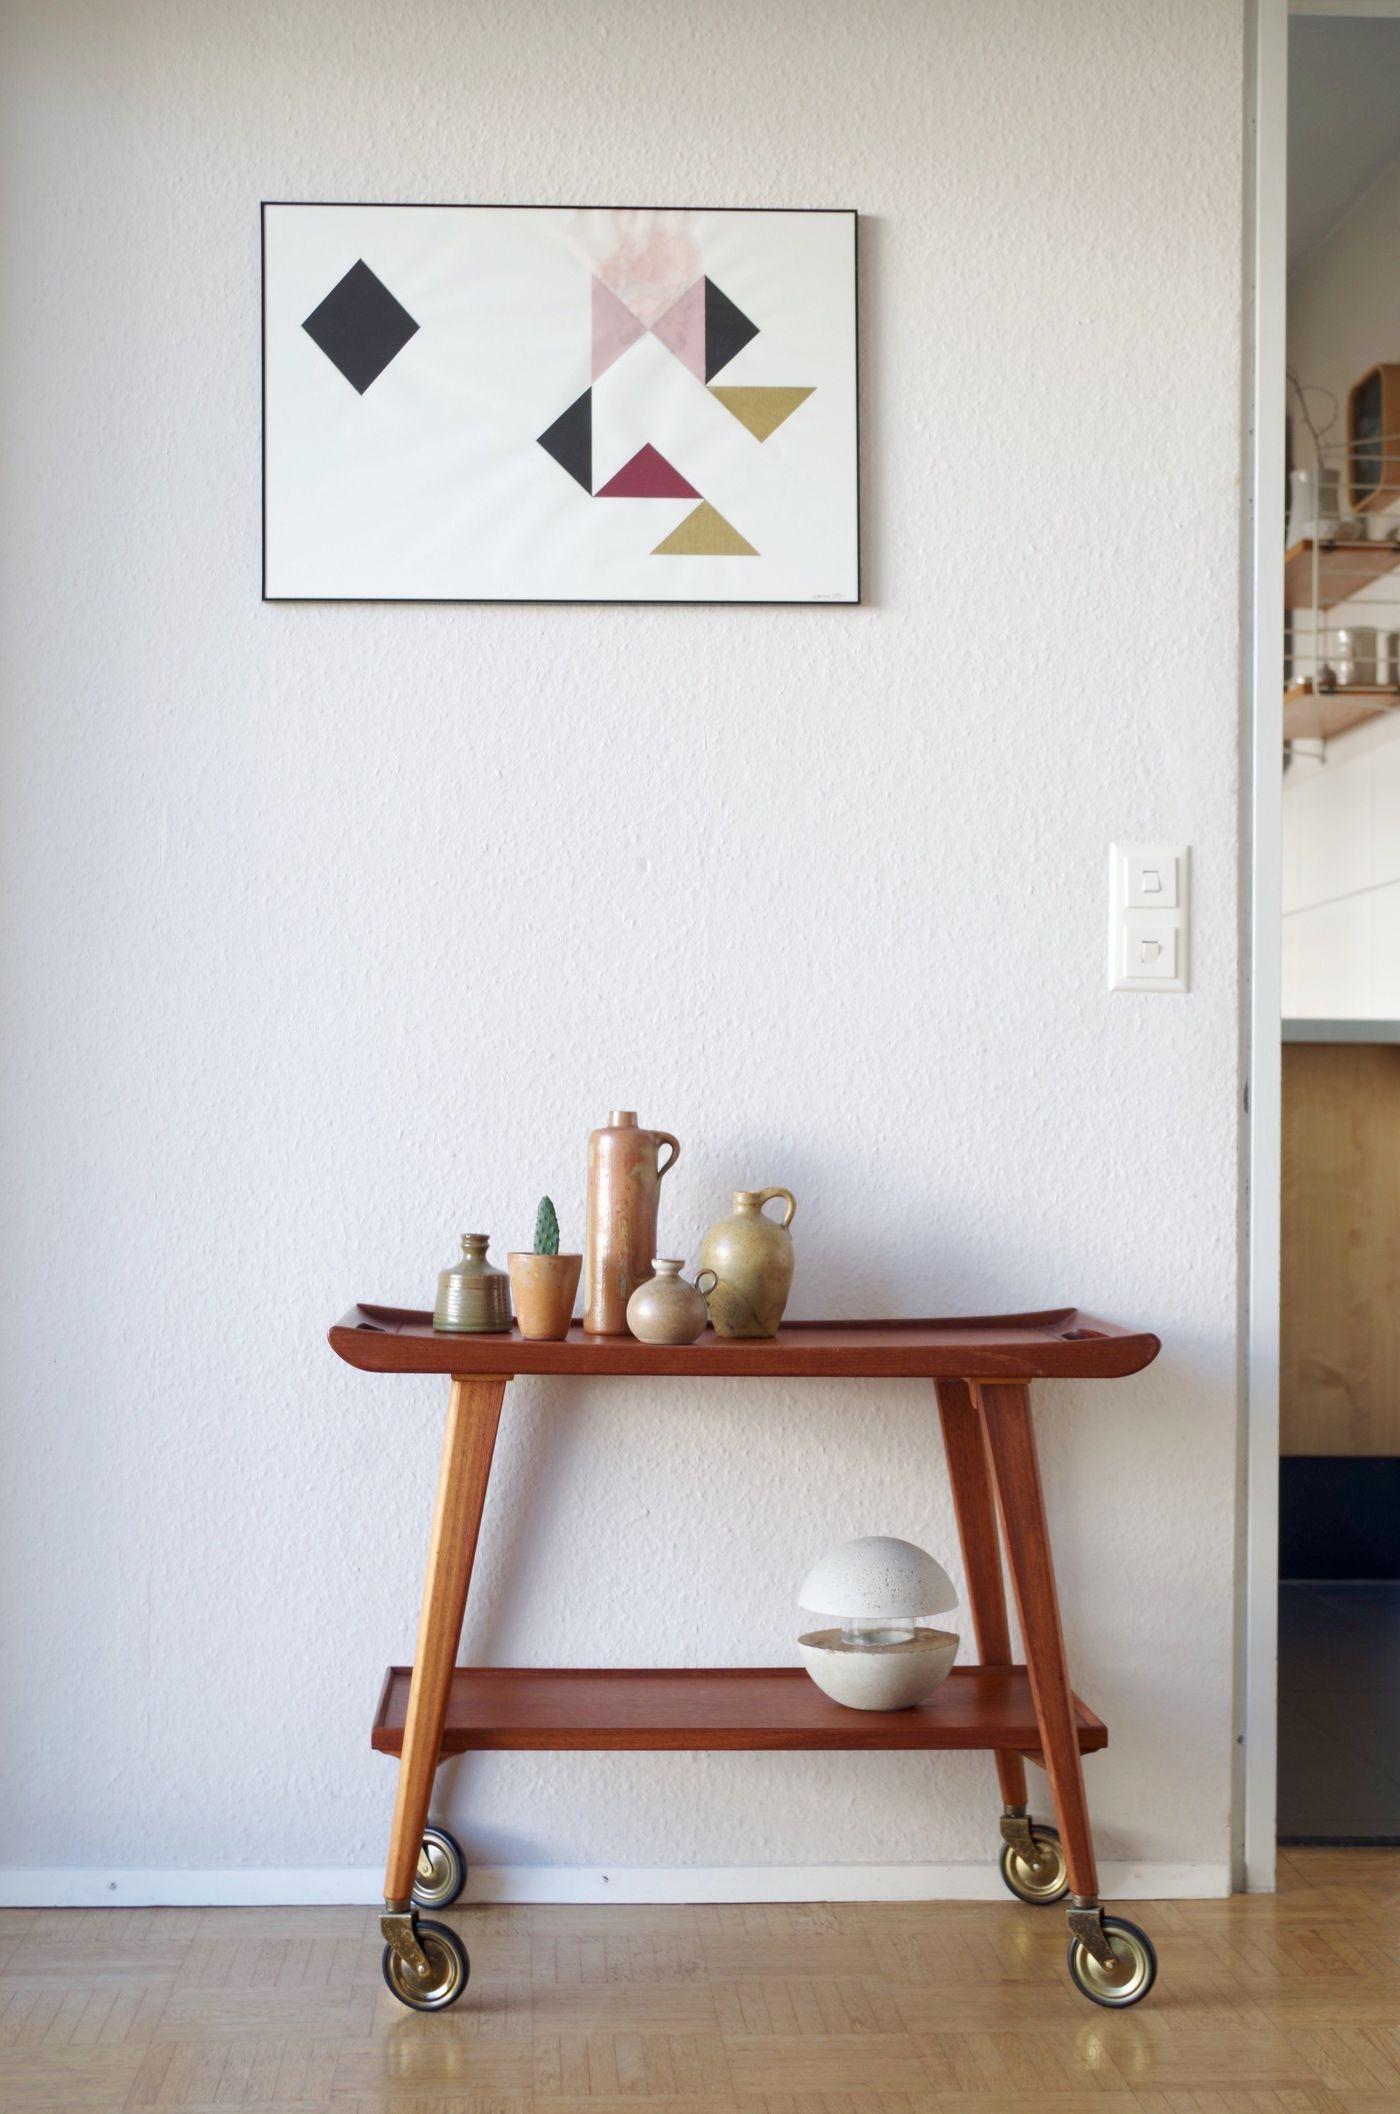 do it yourself ideen f r dein zuhause seite 20. Black Bedroom Furniture Sets. Home Design Ideas